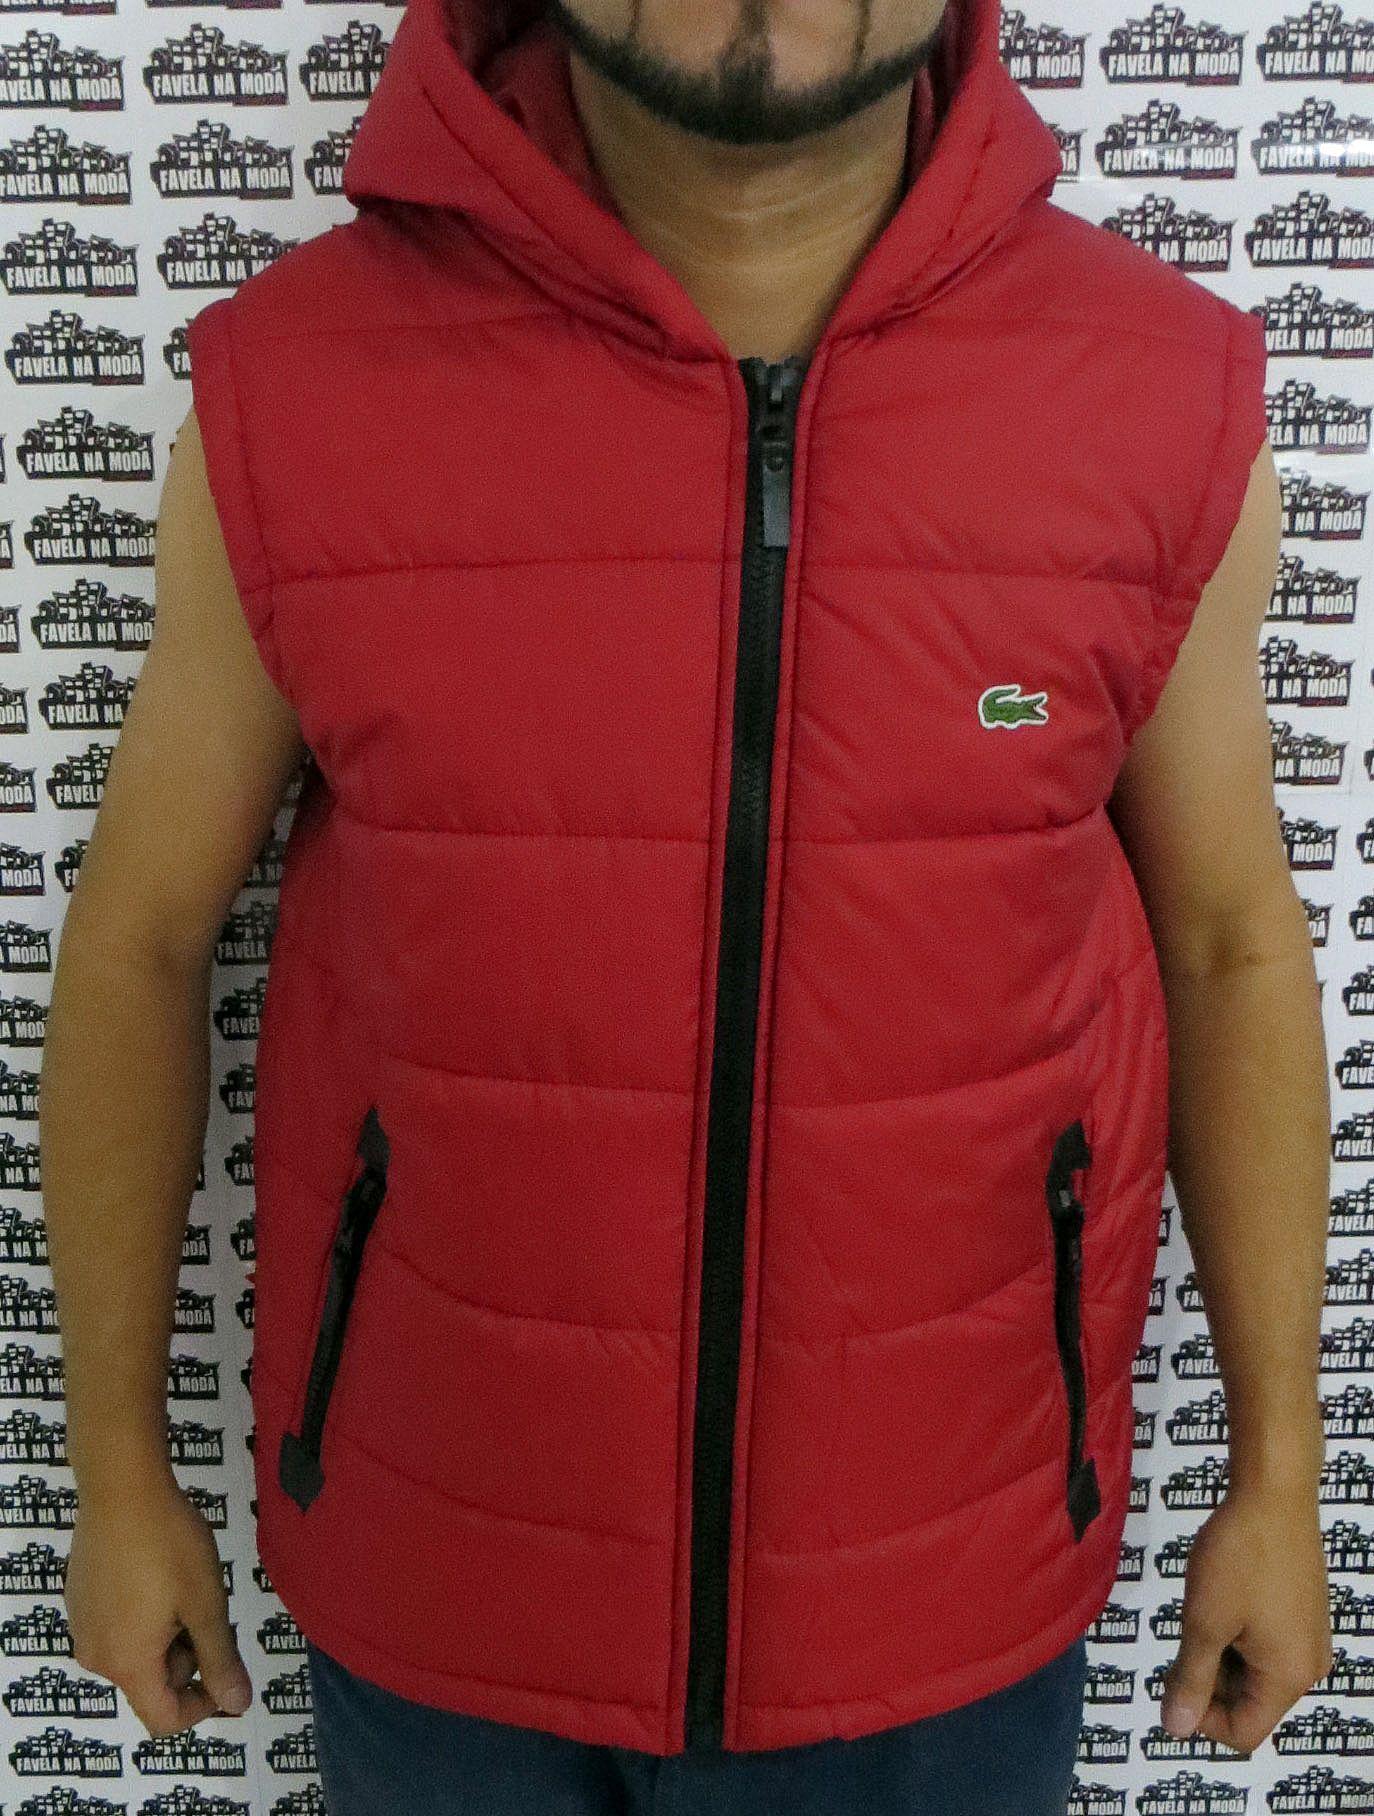 56a98b9b3c17d Lacoste - Favela na Moda Imports